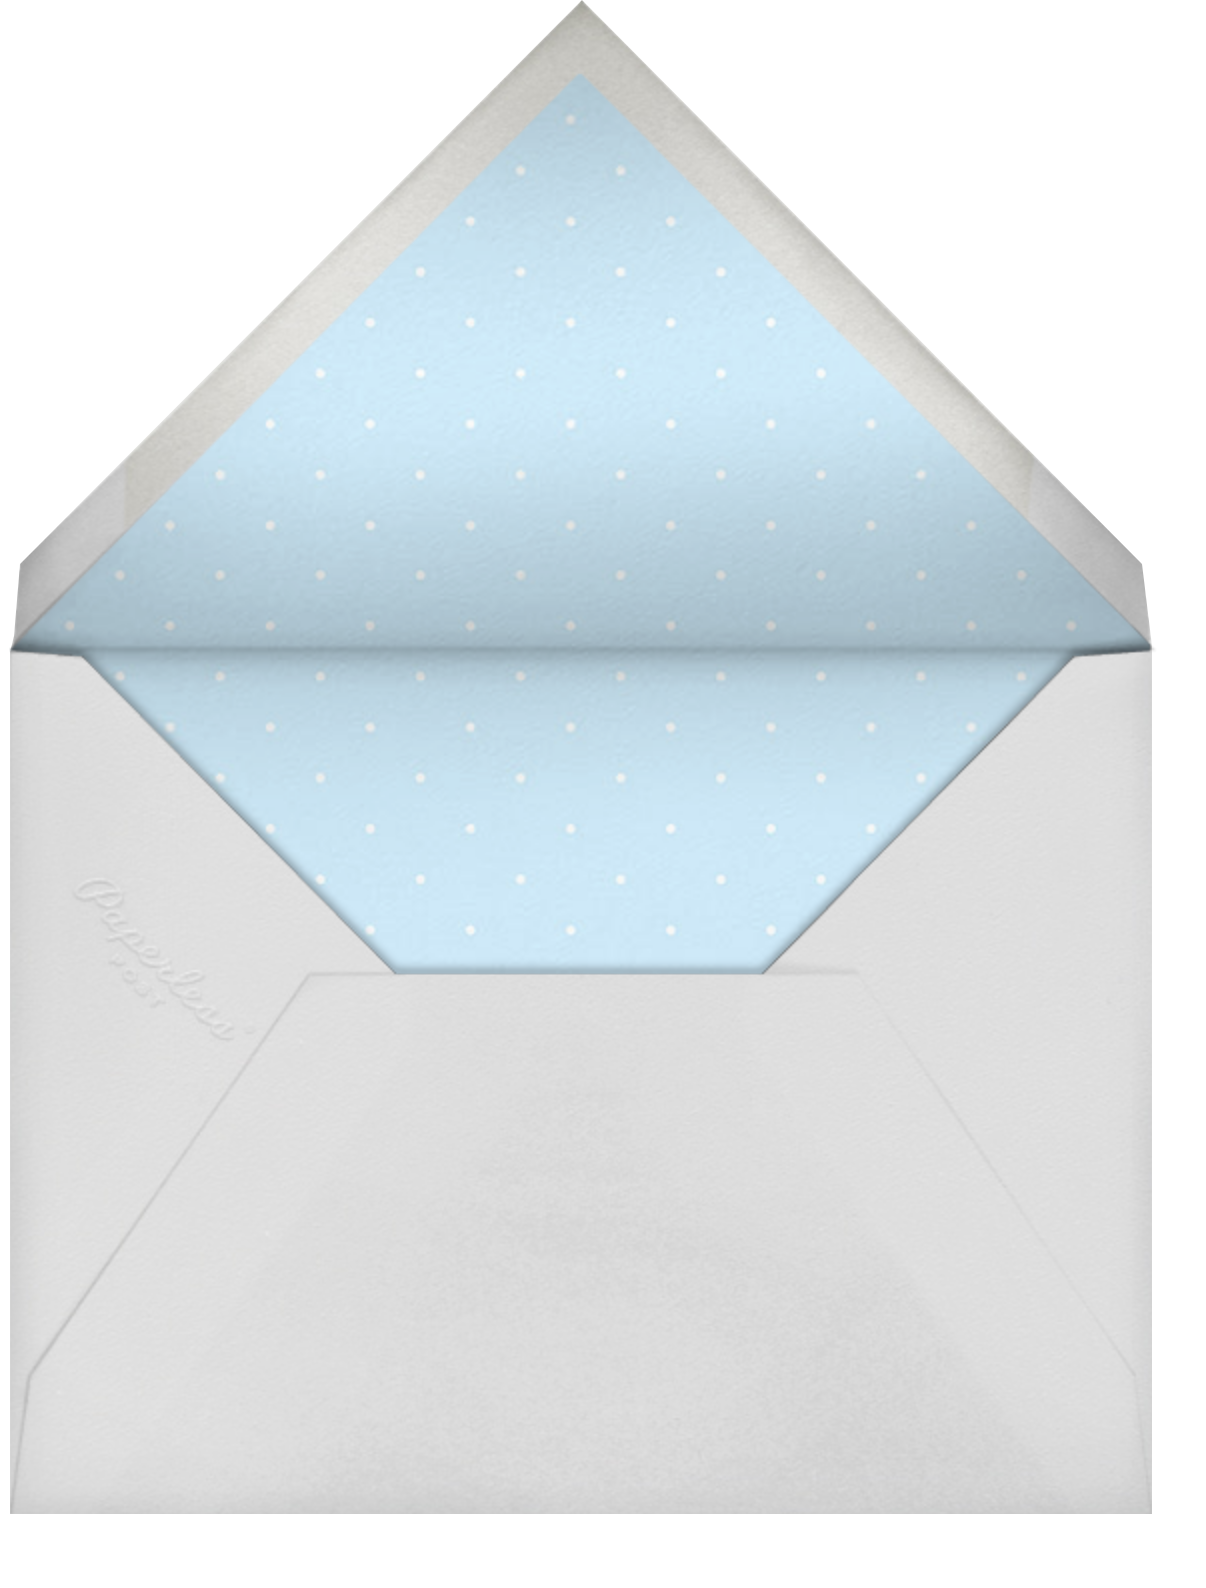 Chicago Skyline Snowglobe - Paperless Post - Winter parties - envelope back